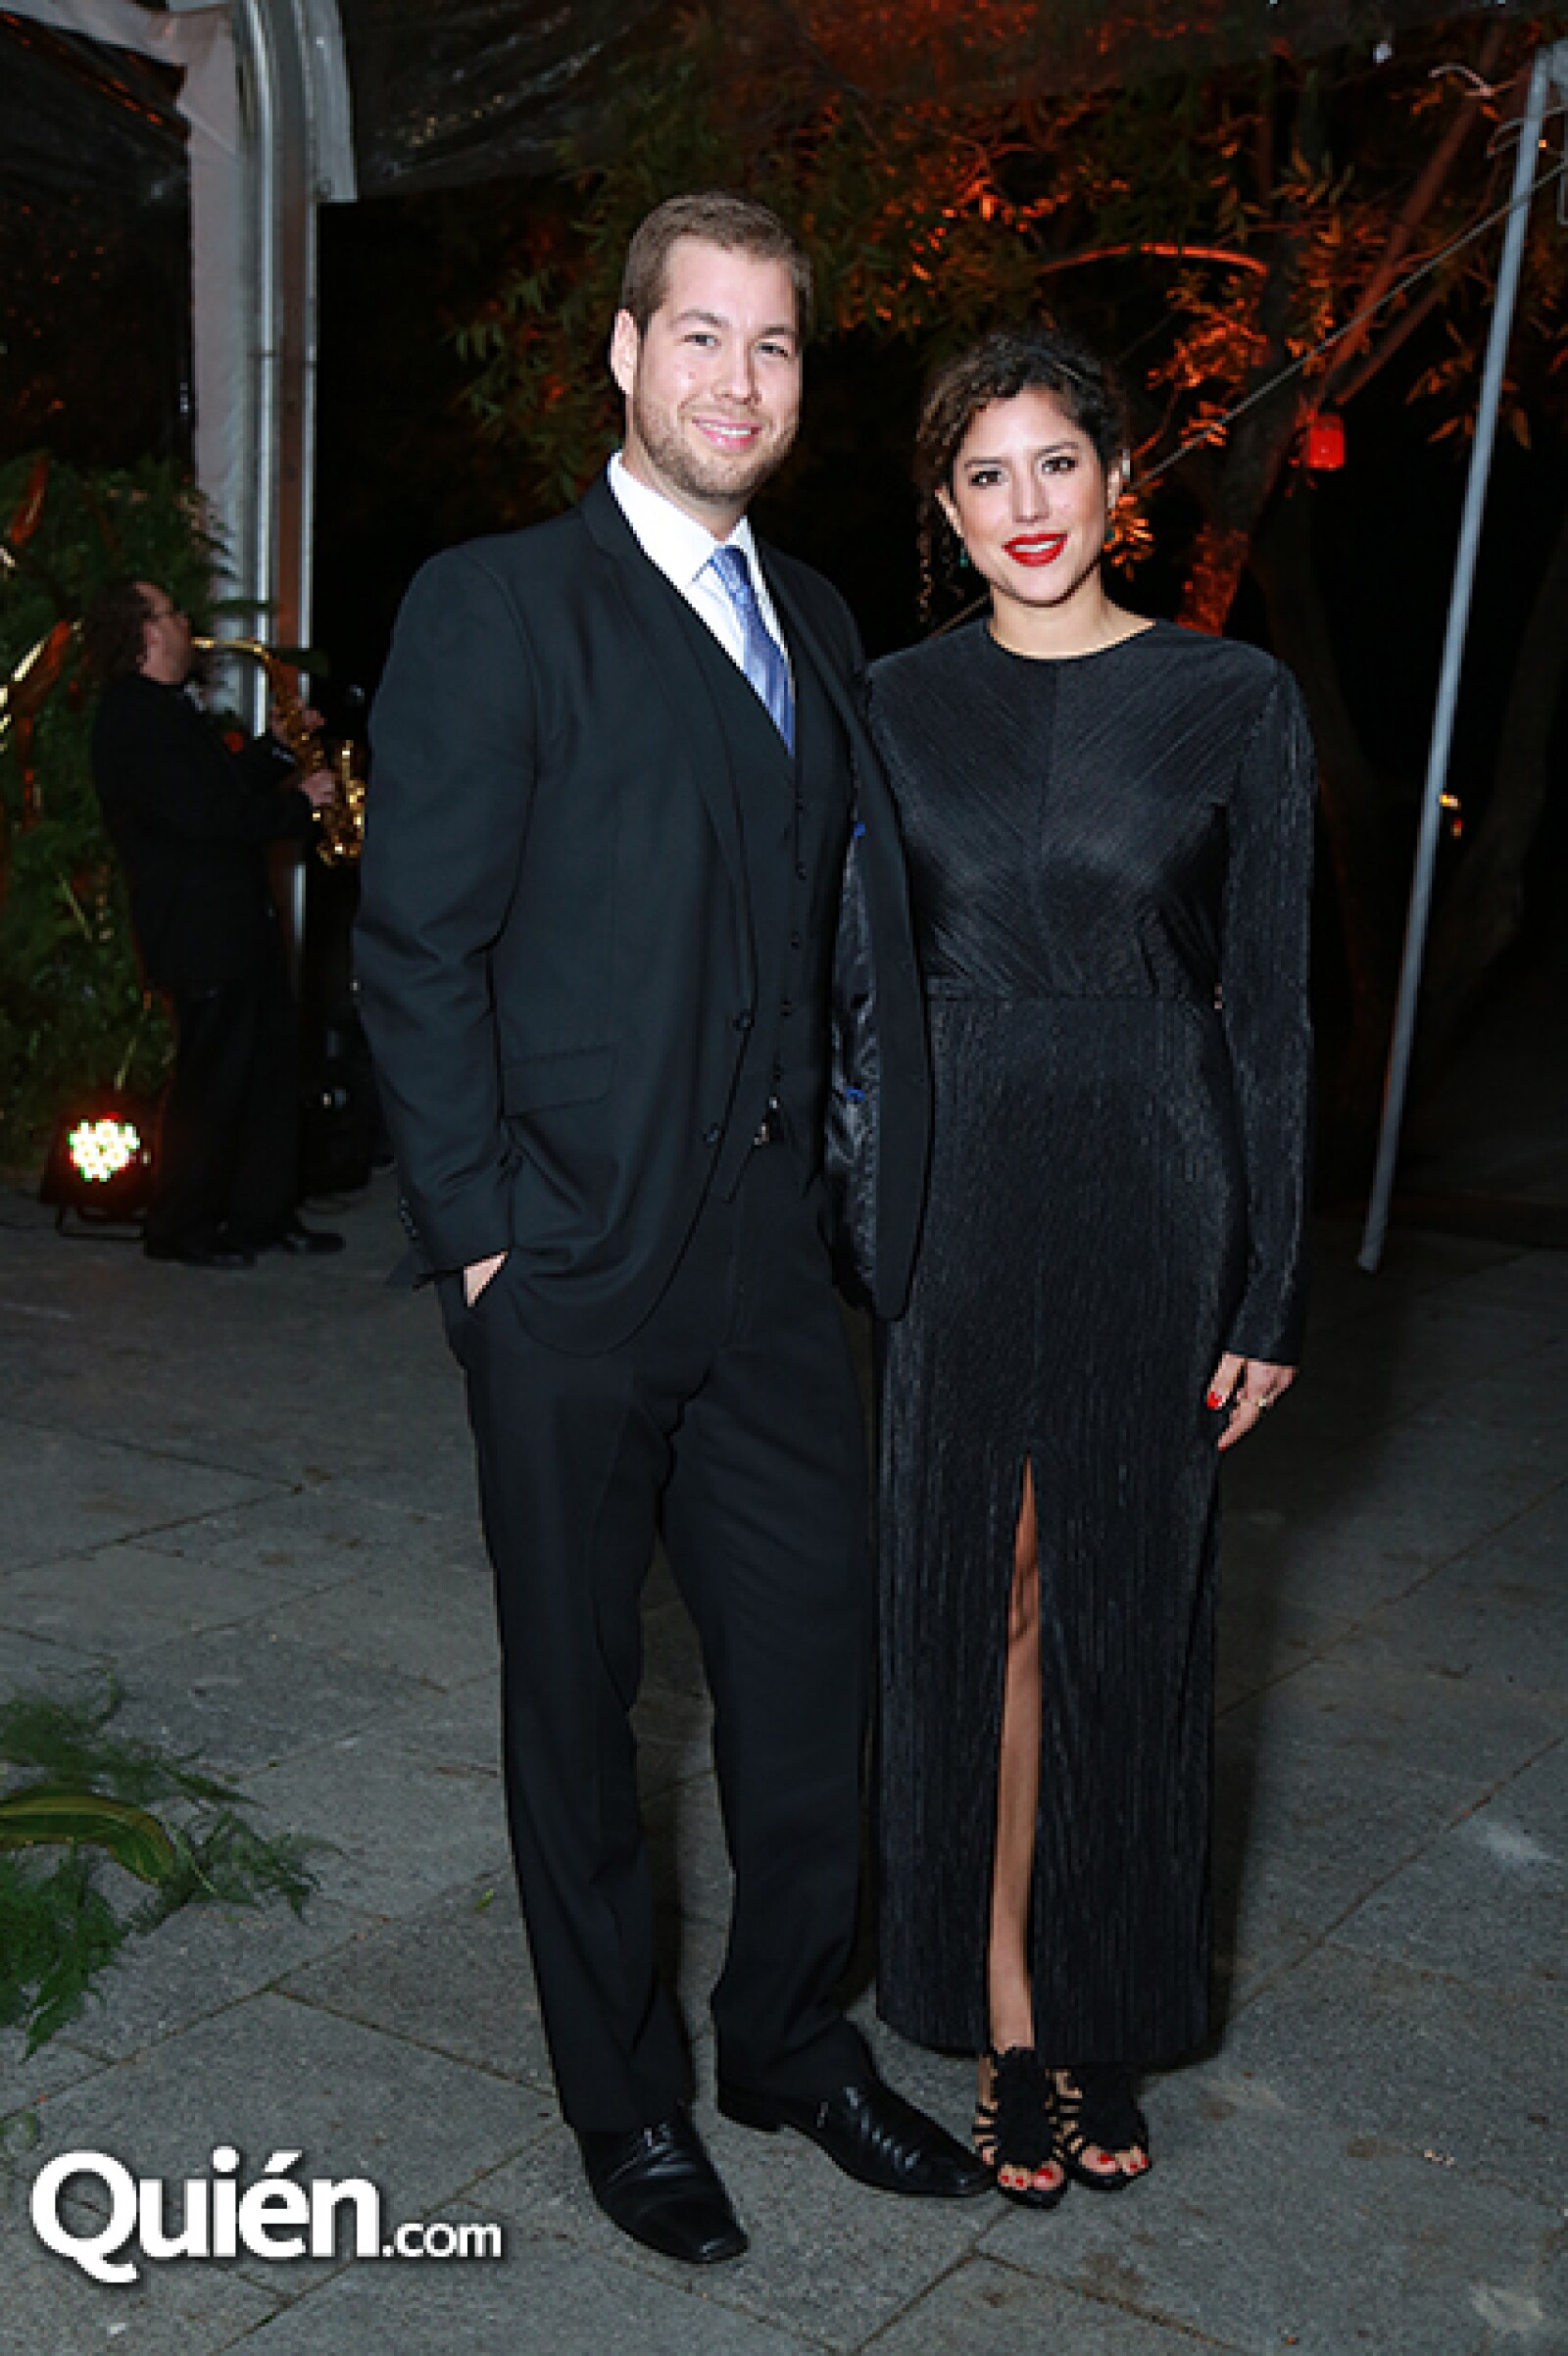 Diego Maldonado y Priscila Baxter